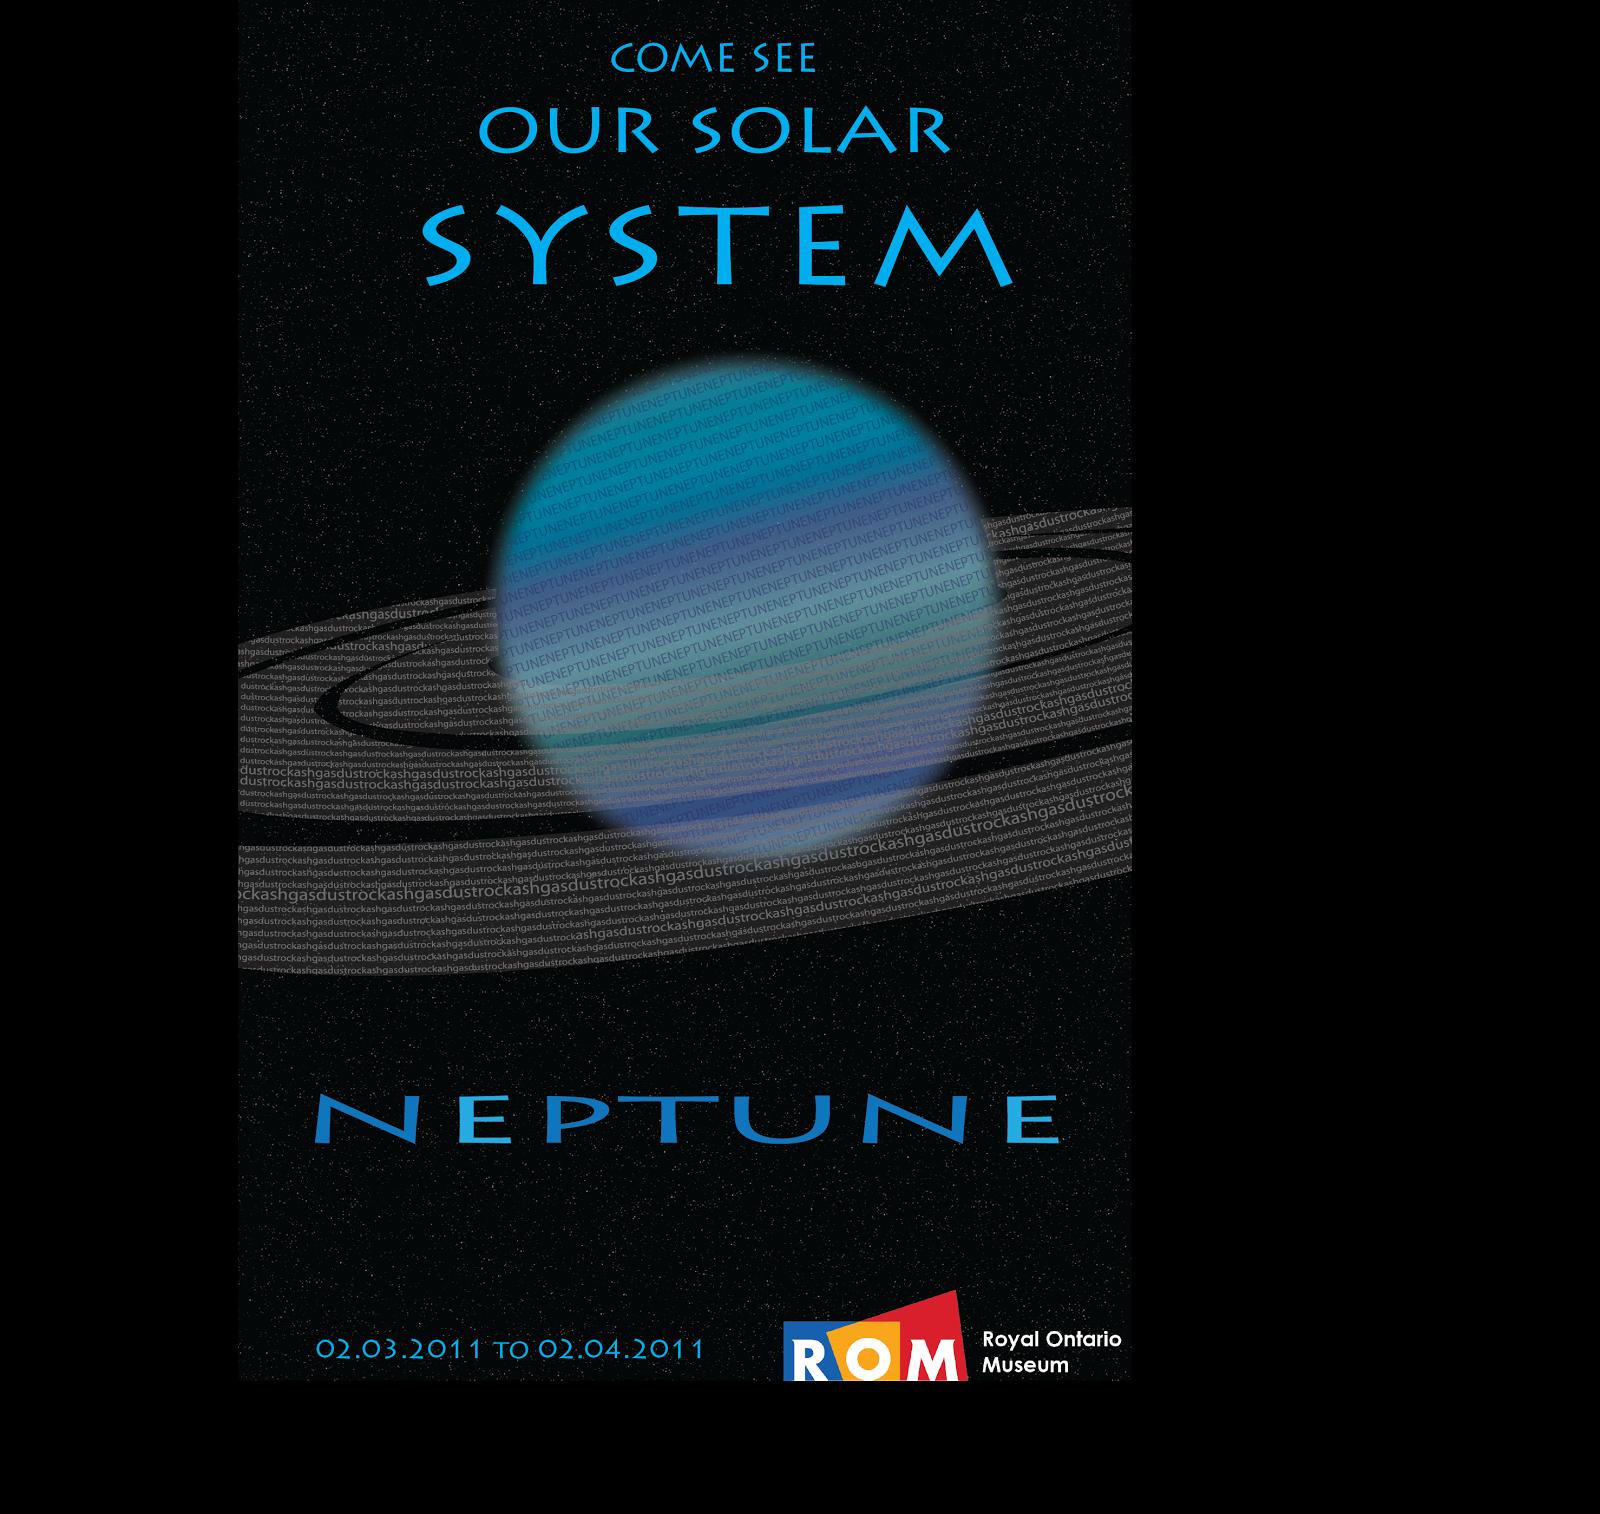 neptune planet travel - photo #39